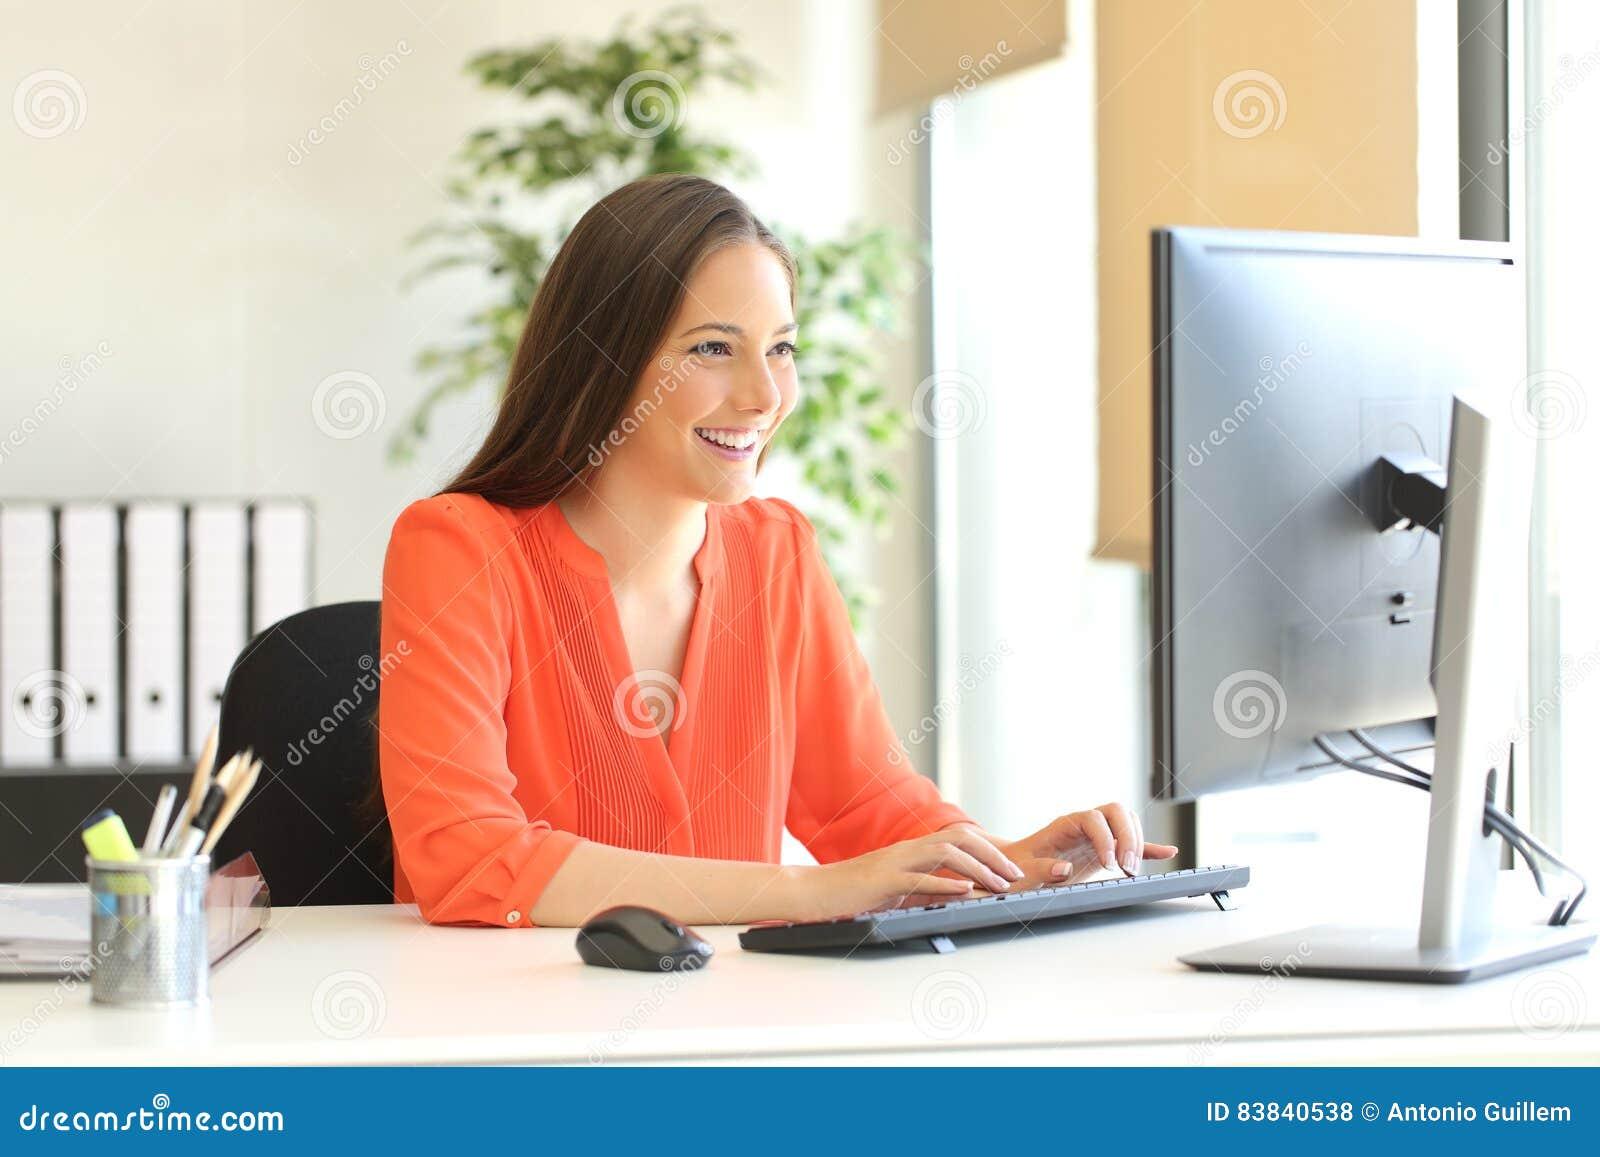 Businesswoman working typing in a desktop computer